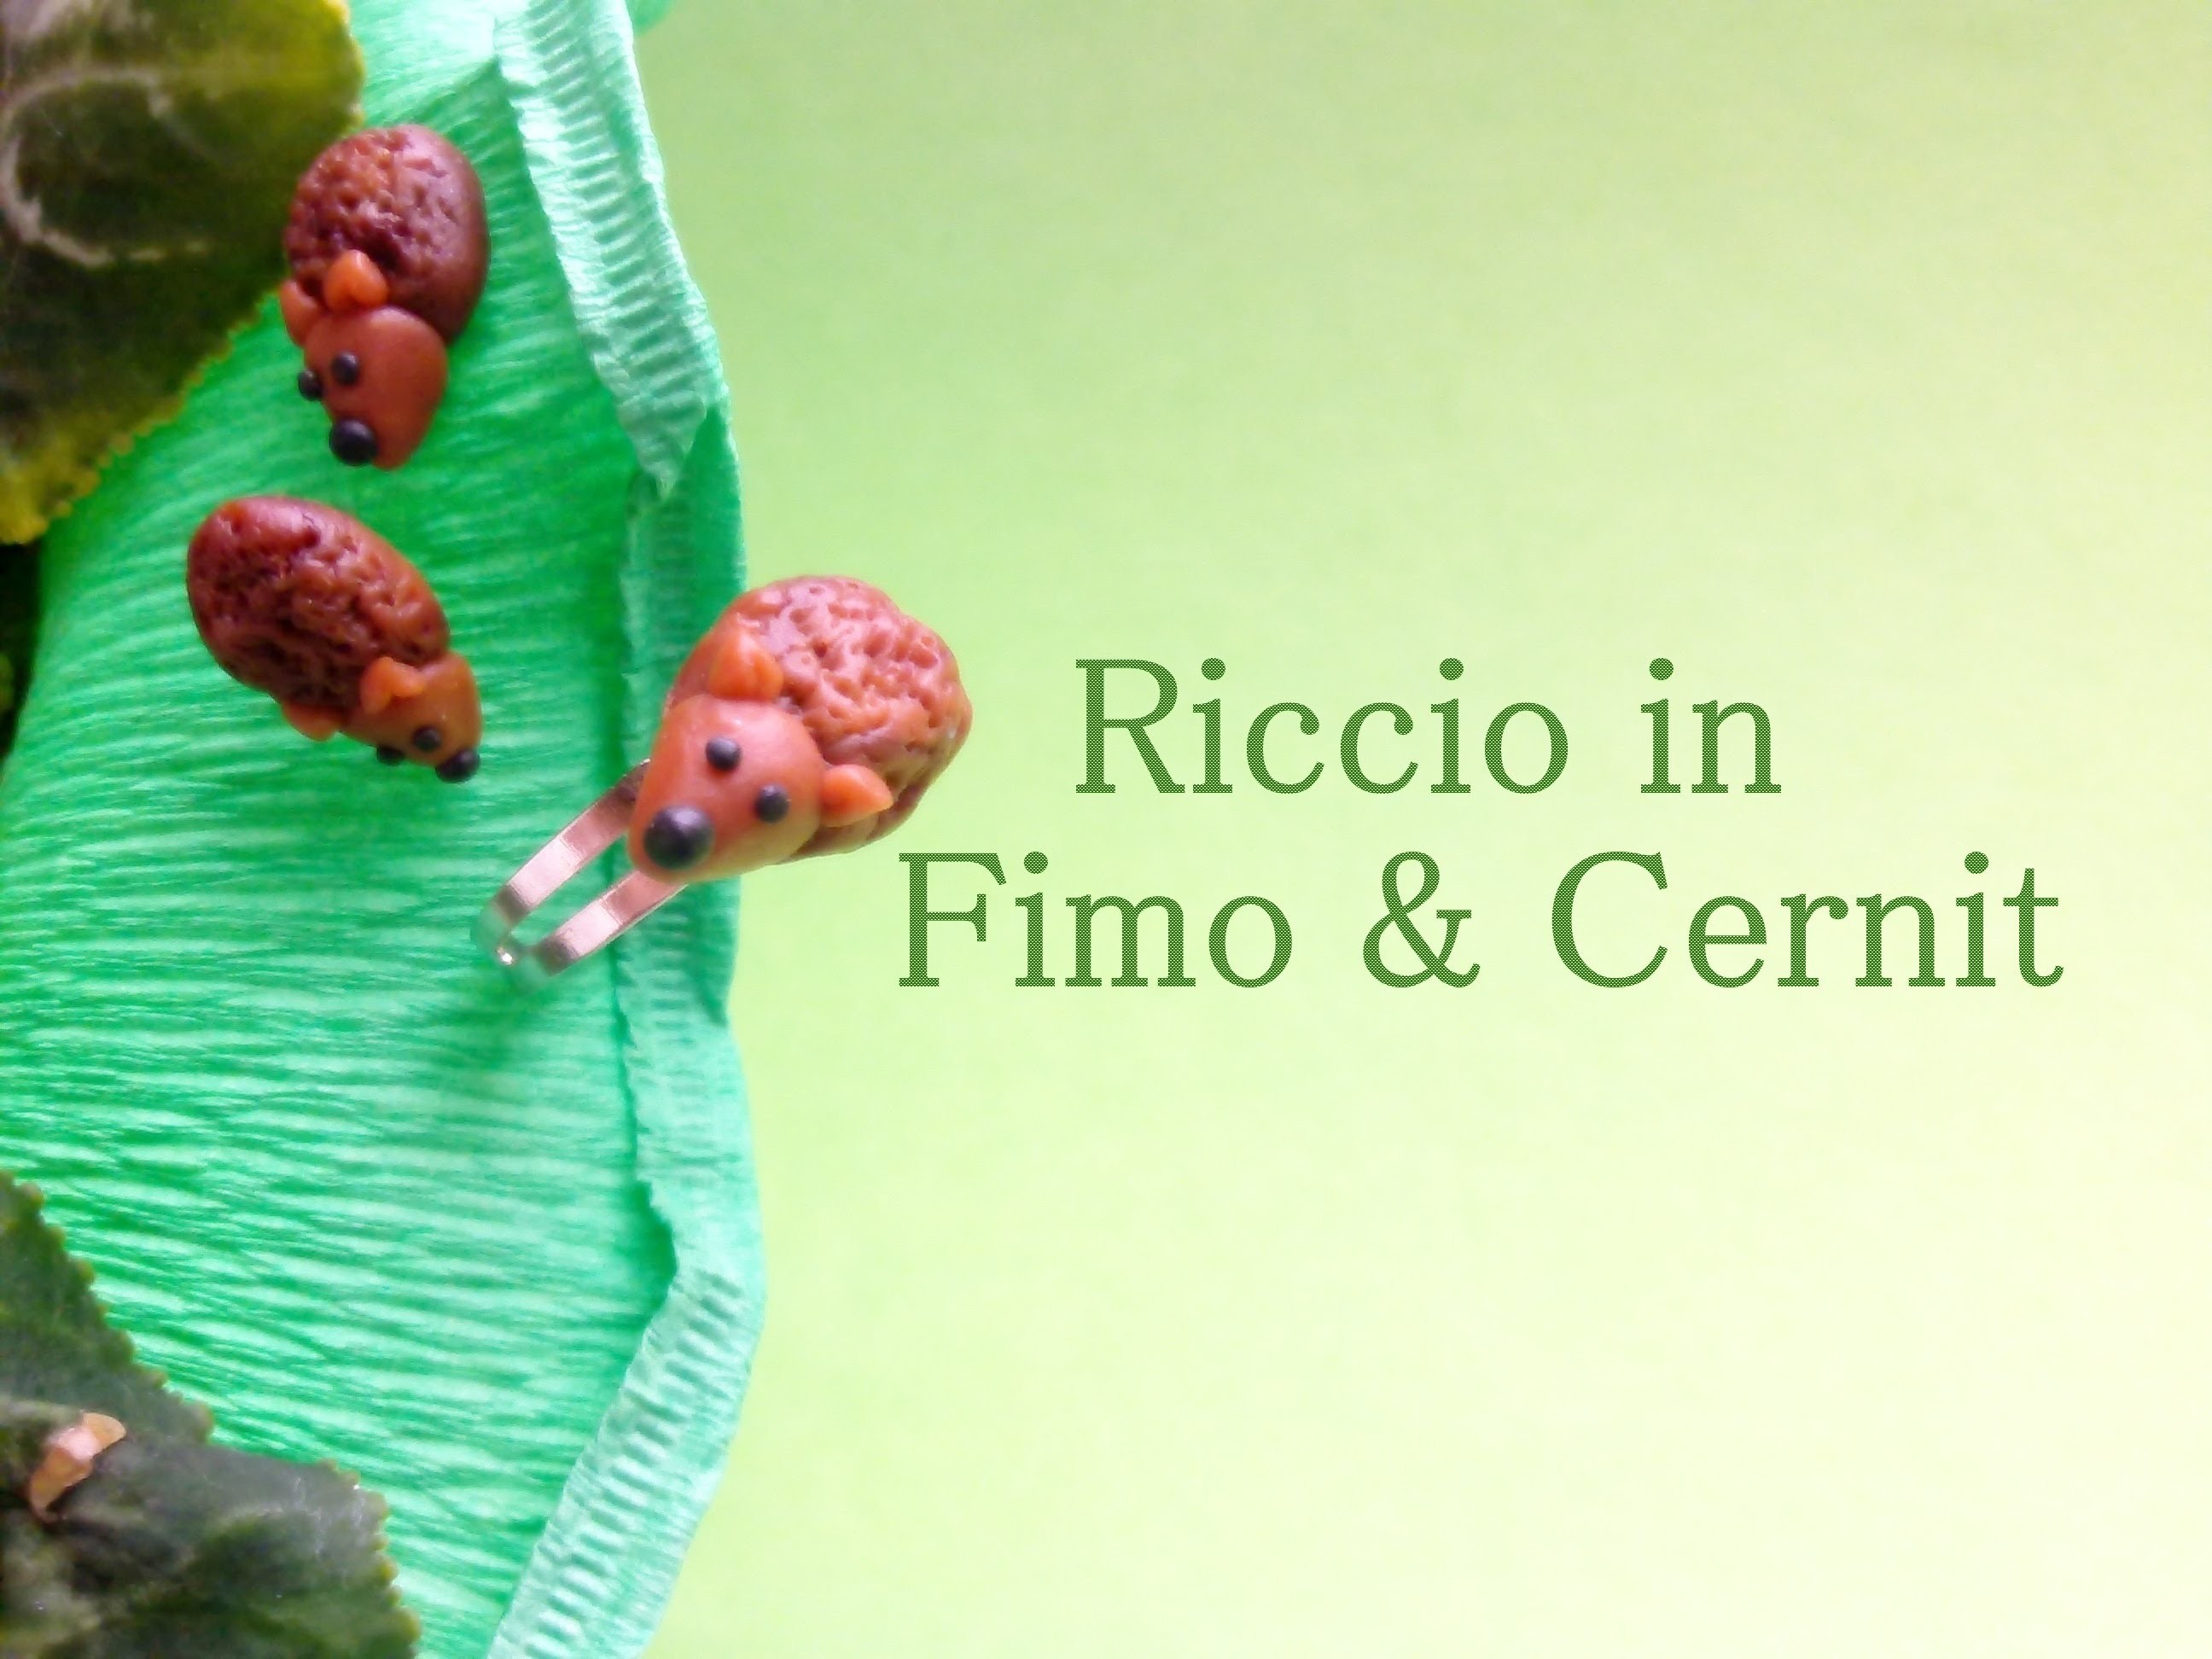 Riccio in Fimo & Cernit ☀ Hedgehog in Fimo & Cernit (DIY anello. ring) - Polymer Clay Tutorial